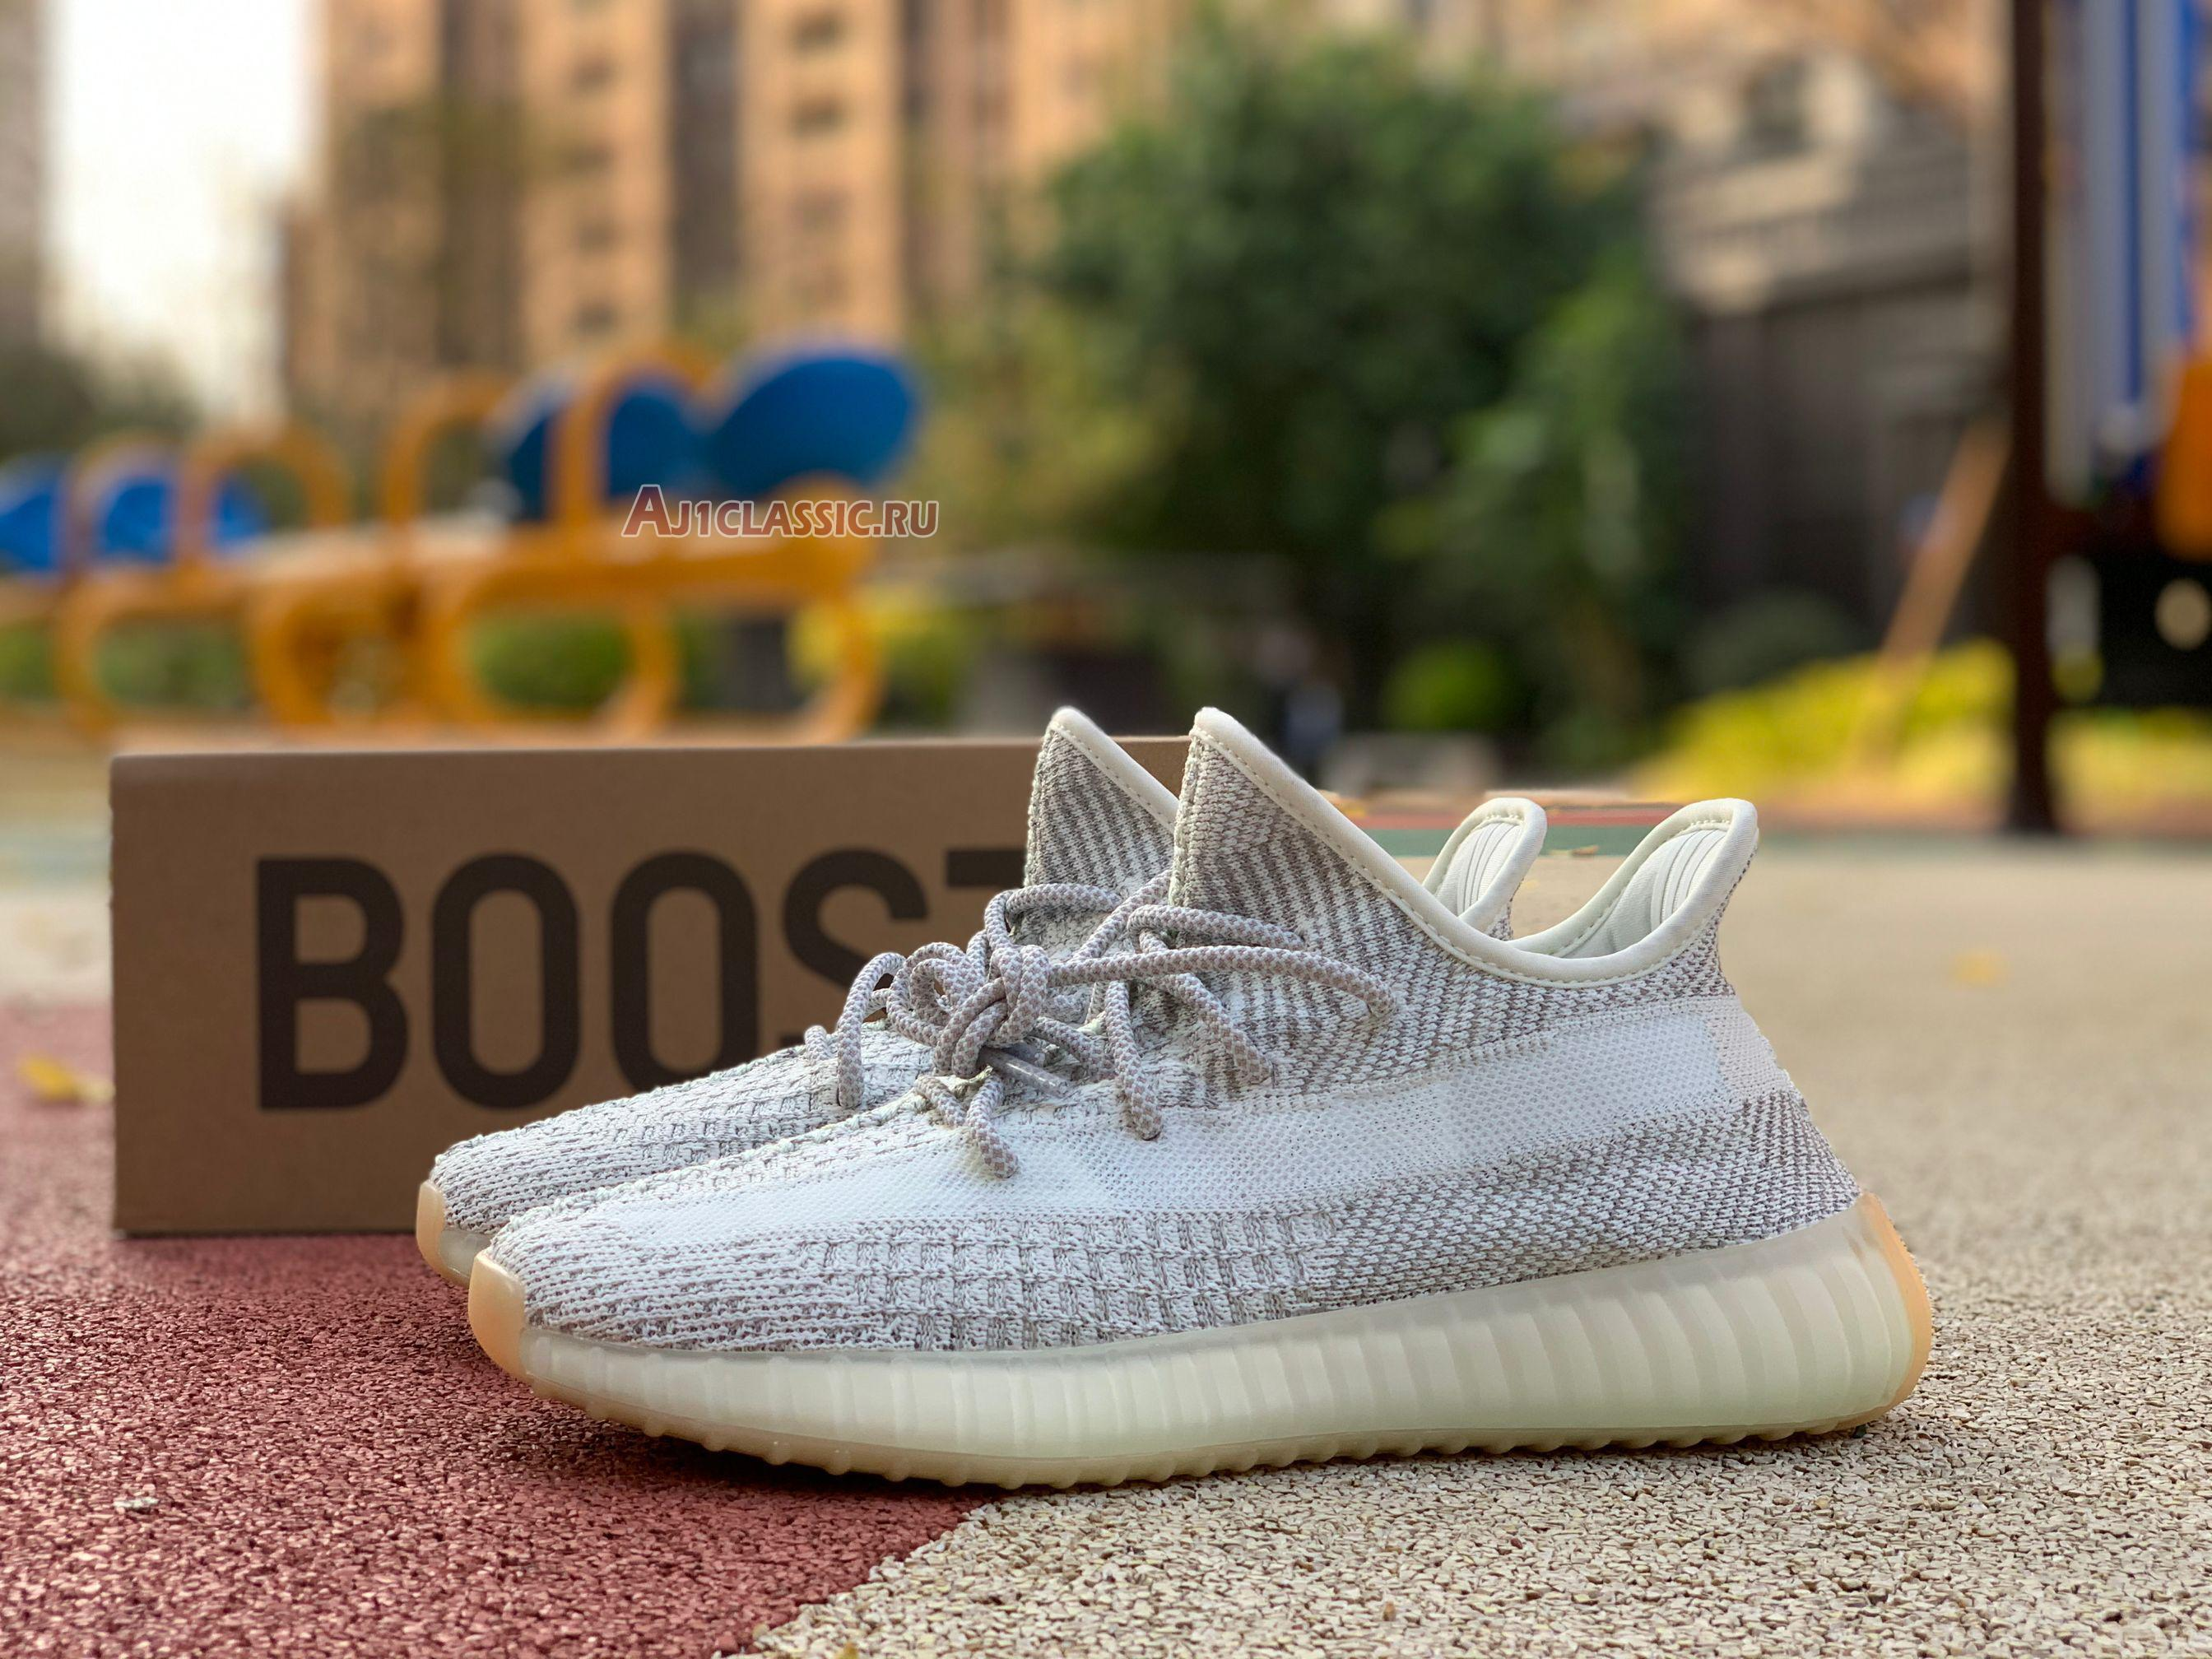 "Adidas Yeezy Boost 350 V2 ""Yeshaya Reflective"" FX4349"